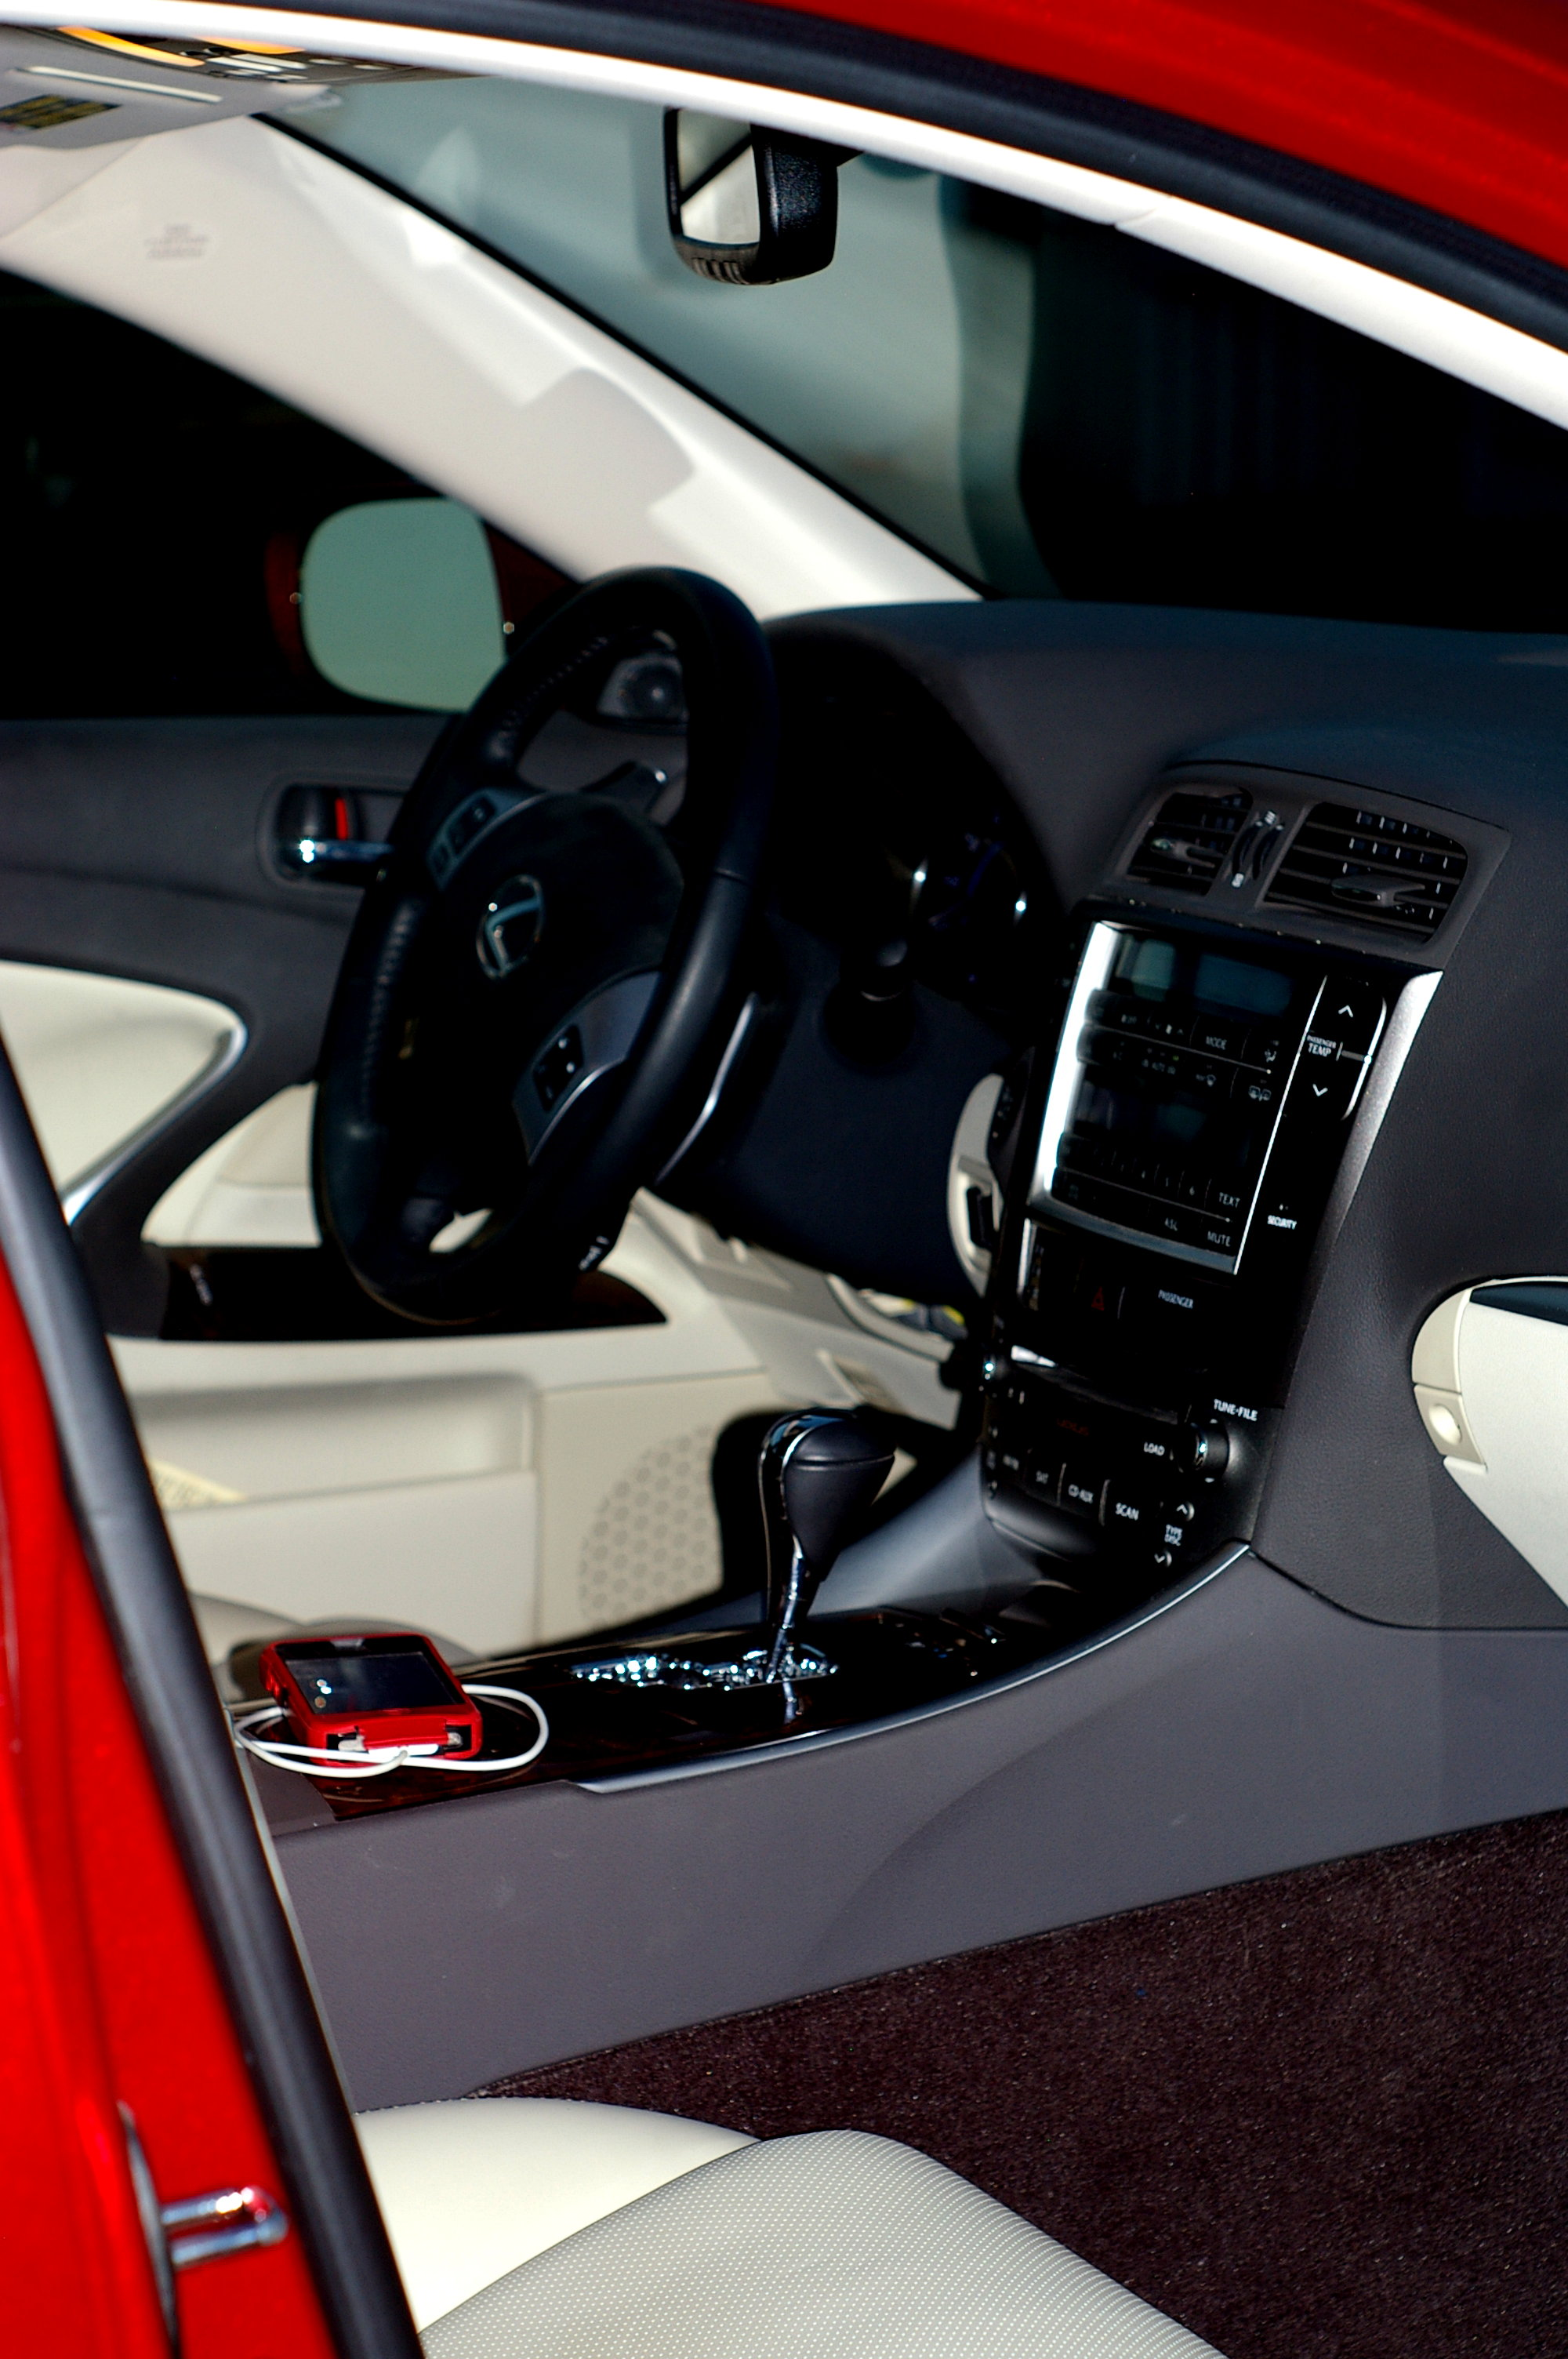 on naijacarshop for ltd twitter sale naija status now lexus car shop available